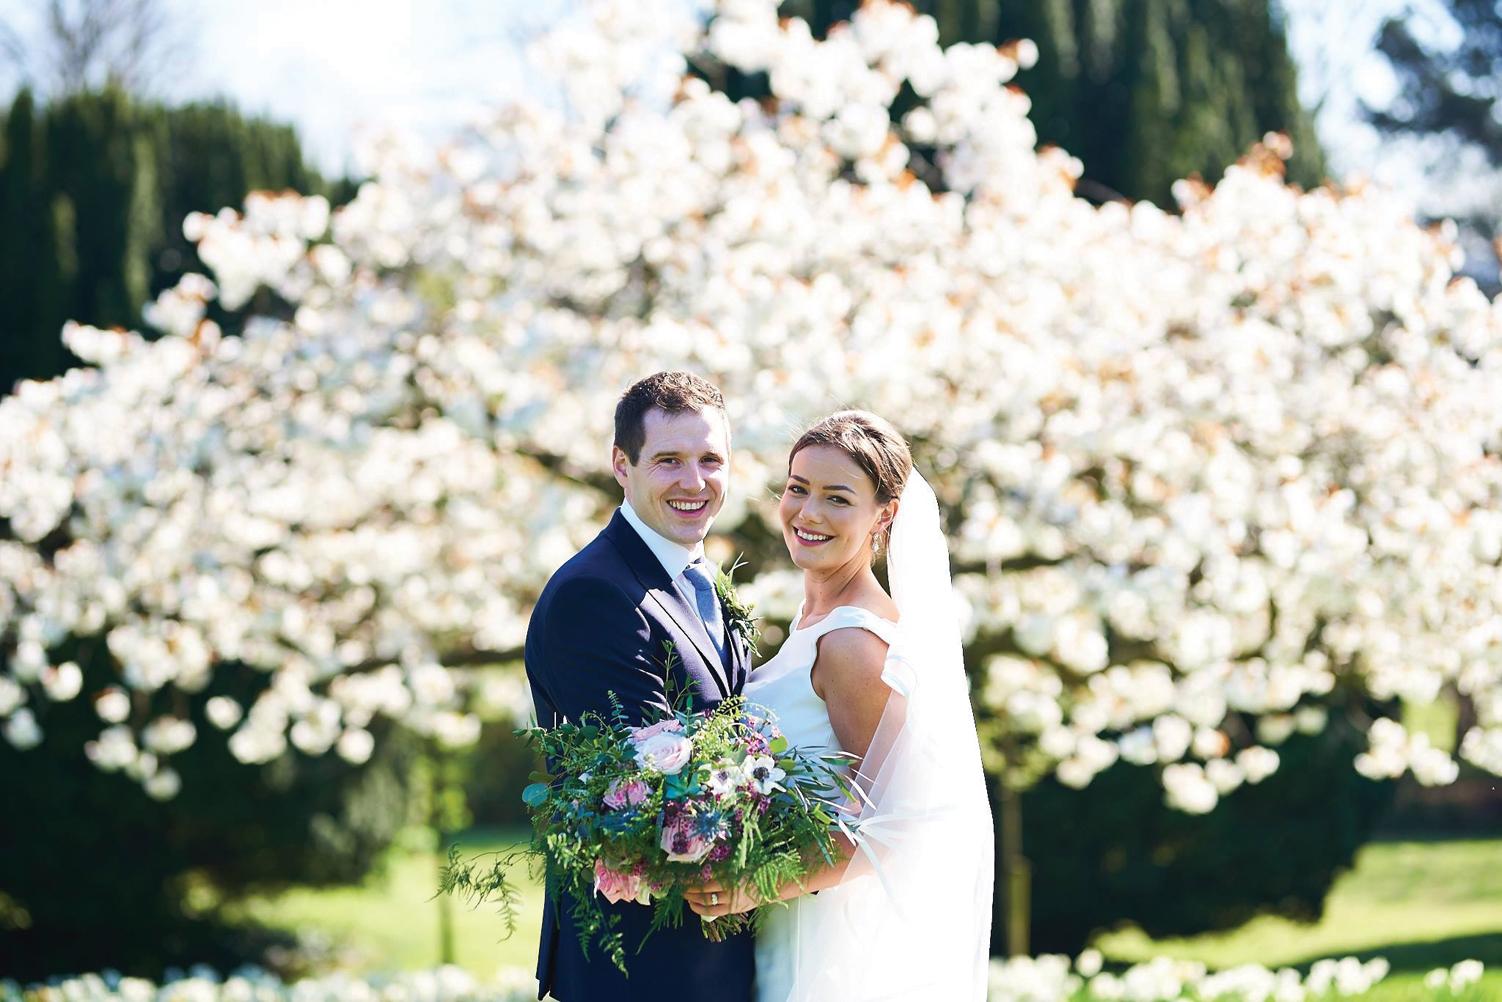 Fleuriste_Flowers_Weddings_ireland_8.jpg